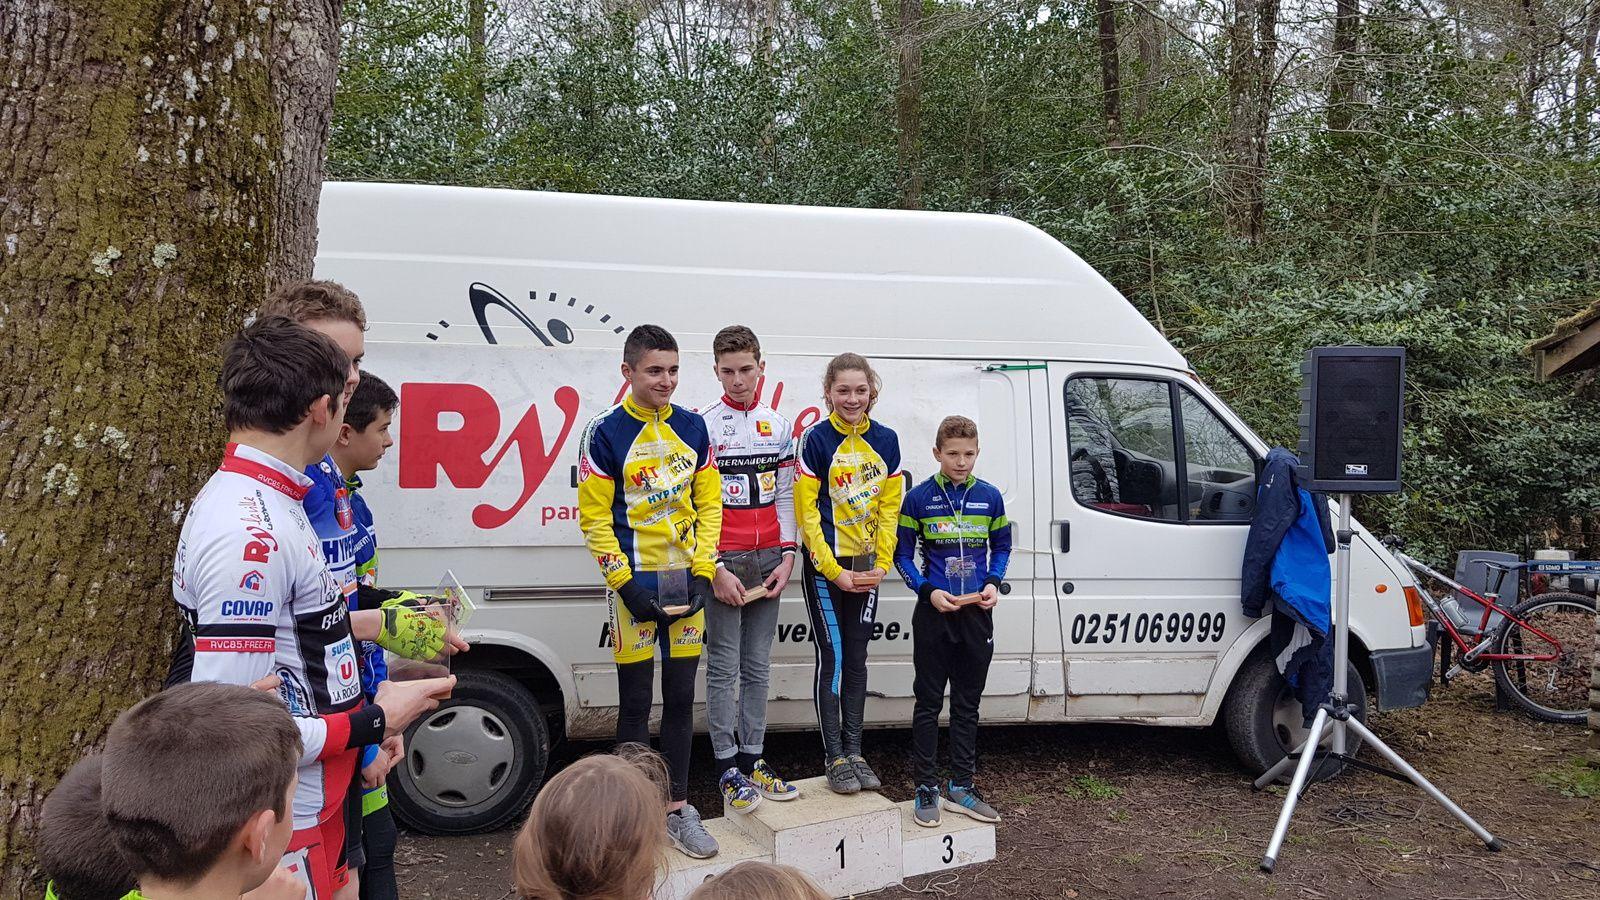 Kids VTT de la Roche sur Yon (18 mars)